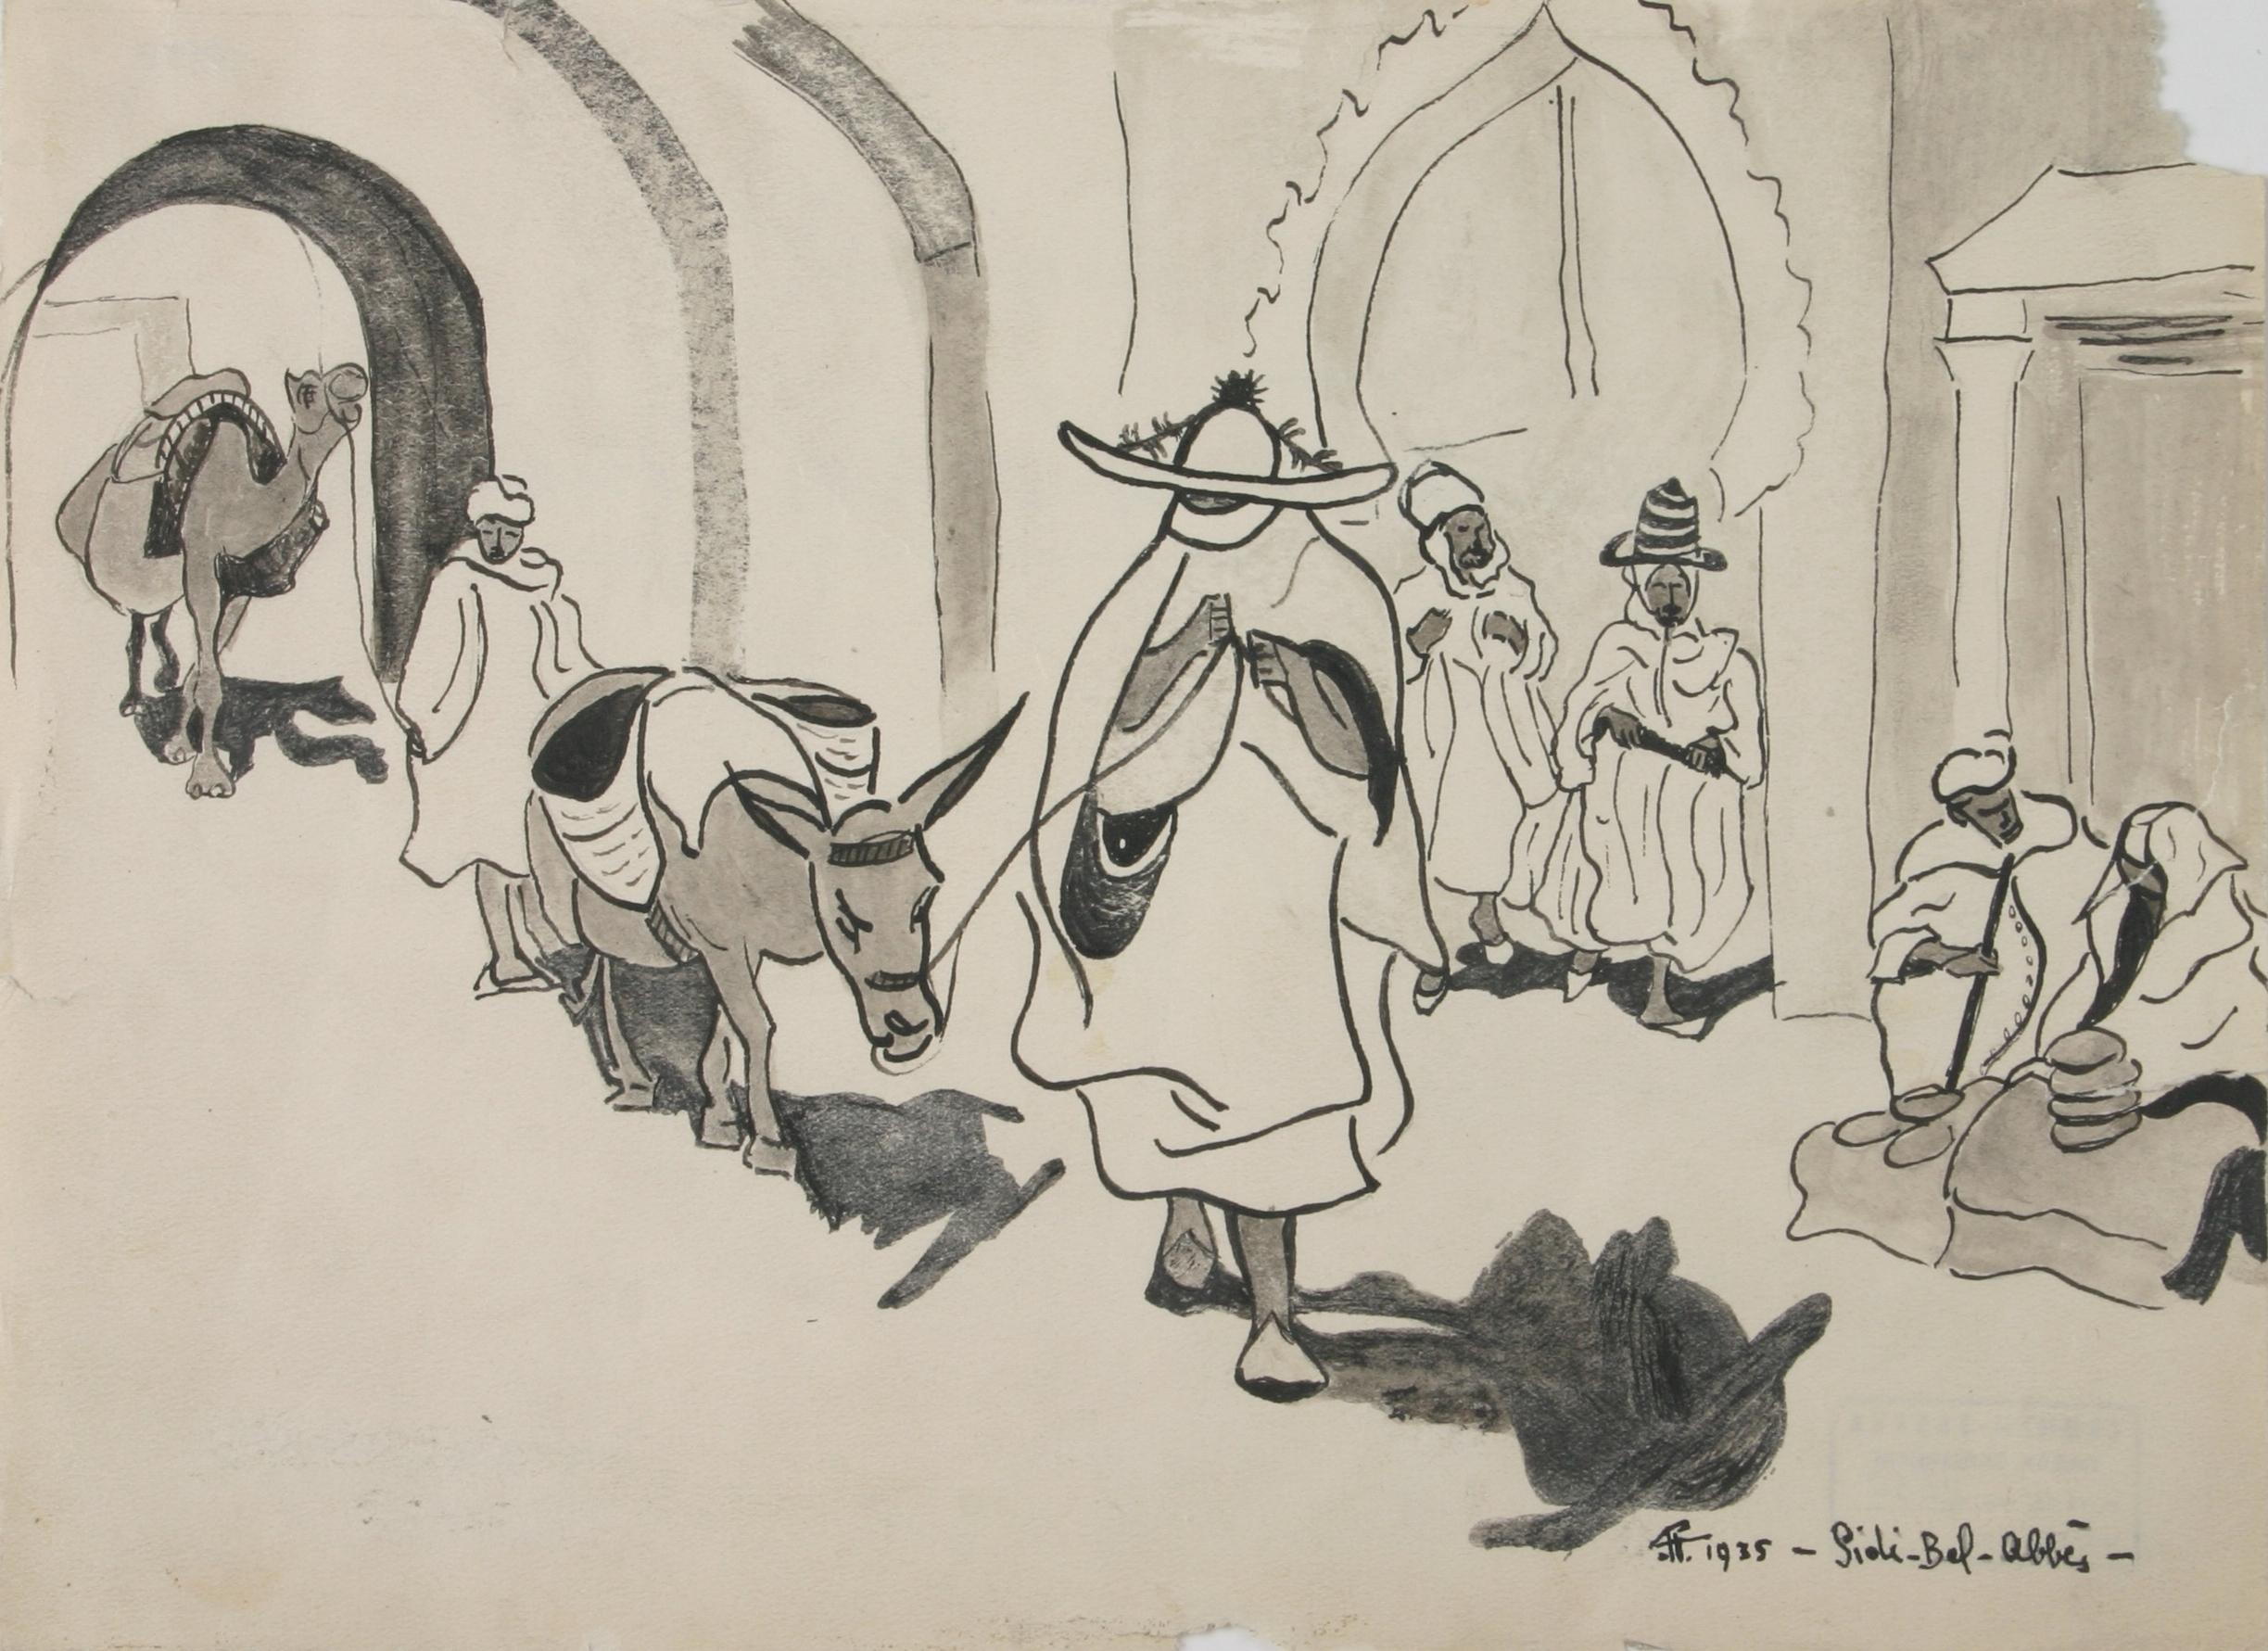 Bela Pavlovic, Sidi Bel Abes u Alziru, 1935.